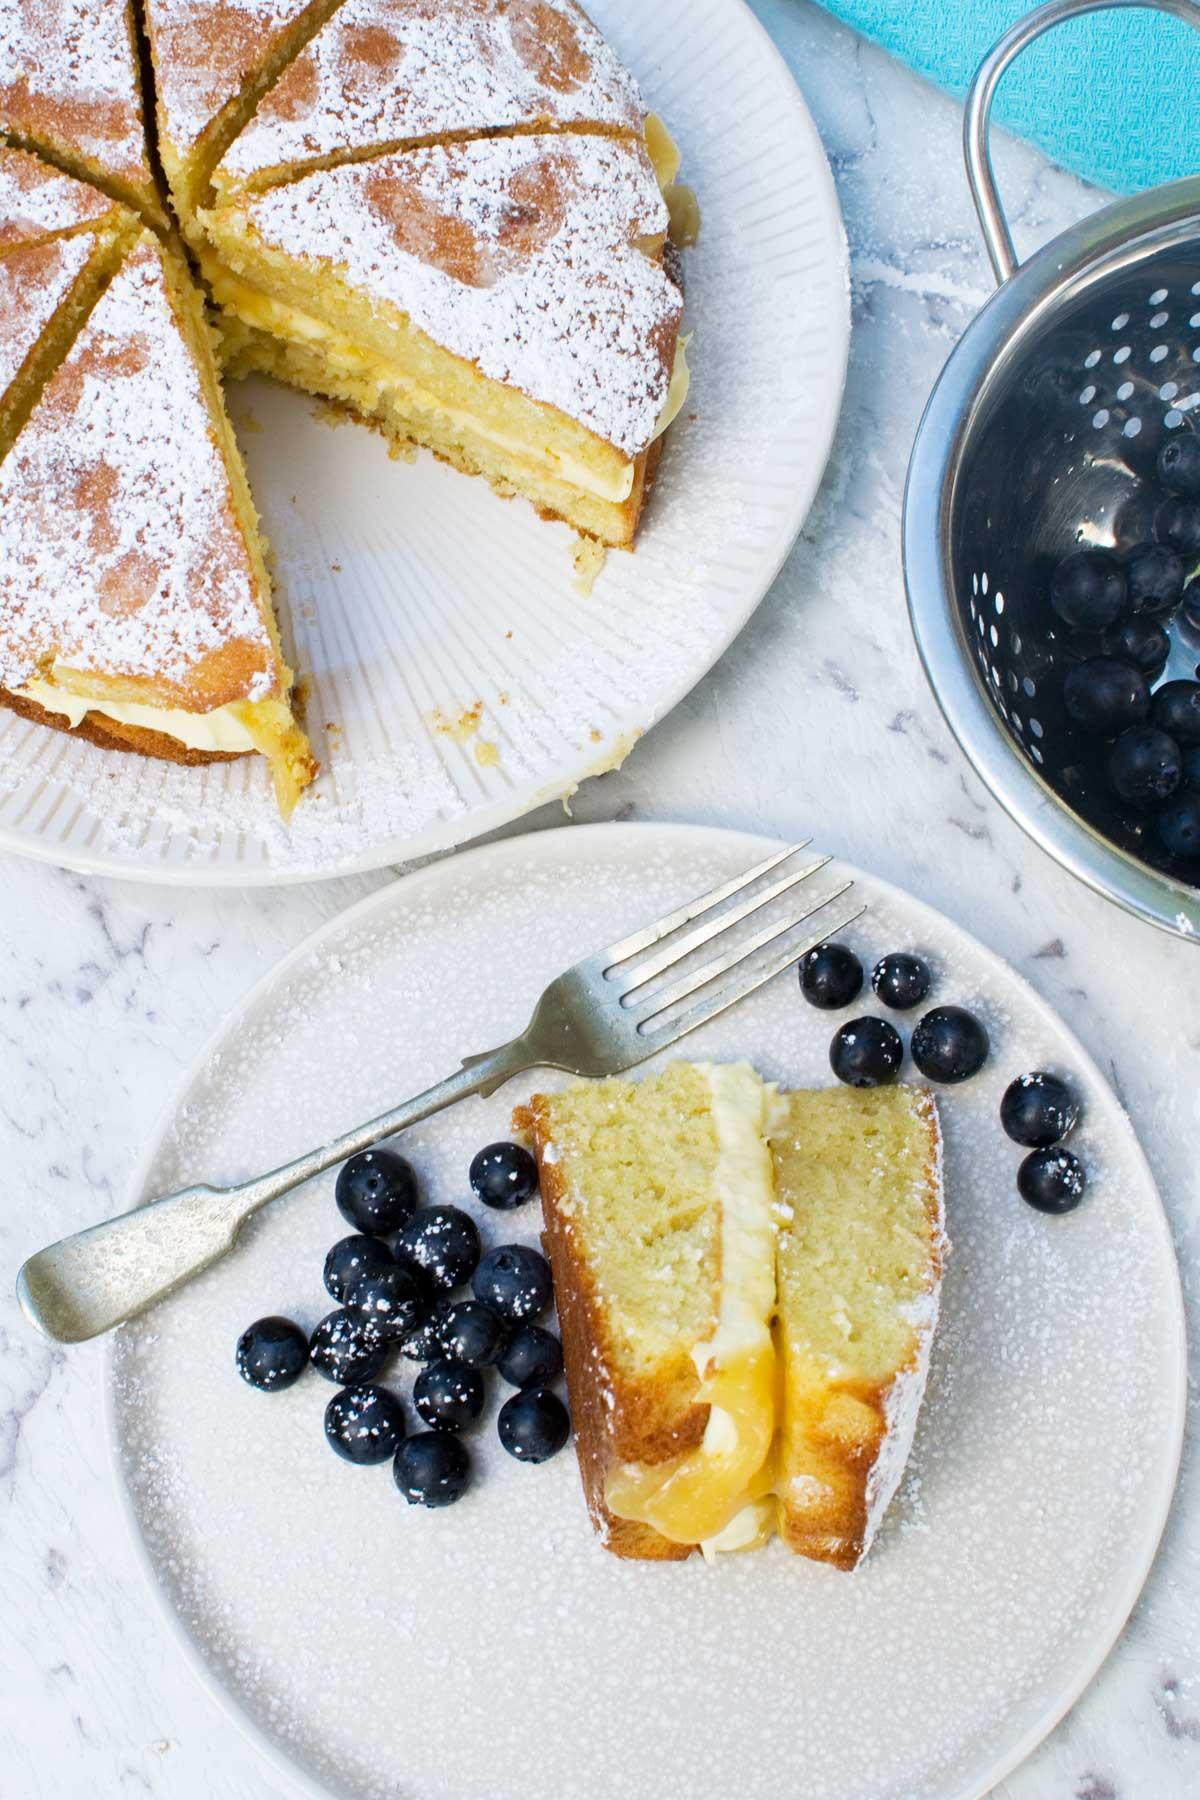 A slice of lemon mascarpone cake on a plate and the rest of the cake on a white plate on a marble background from above